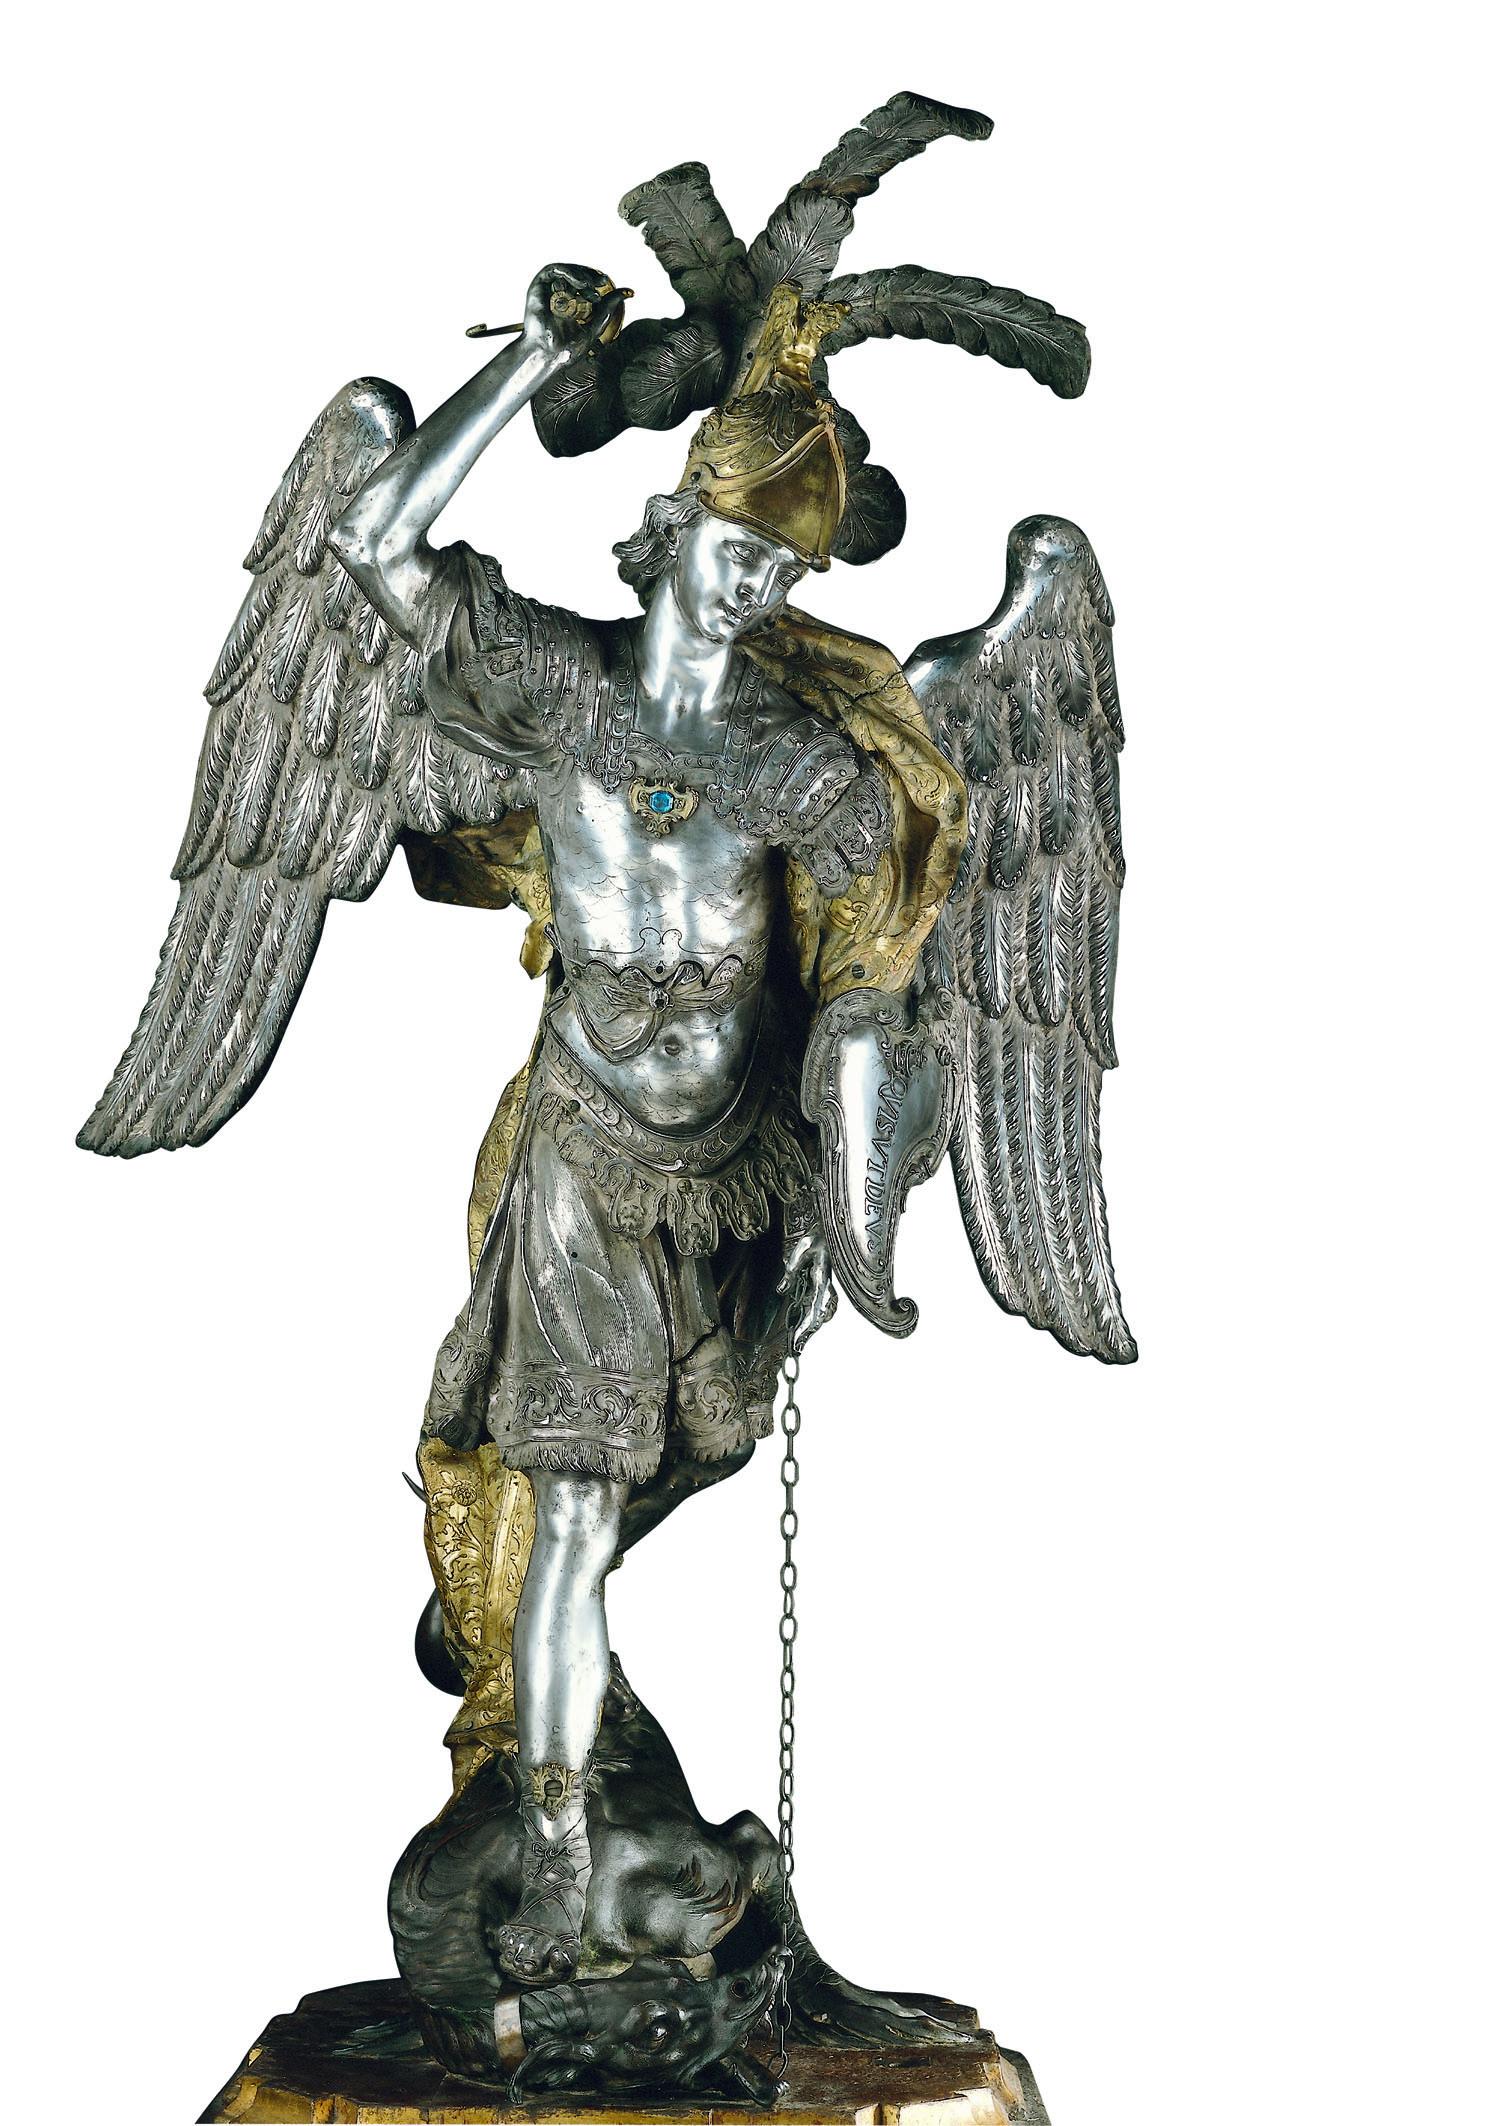 Gian-Domenico-Vinaccia-San-Michele-Arcangelo-1691-argento-bronzo-bronzo-dorato-rame-dorato